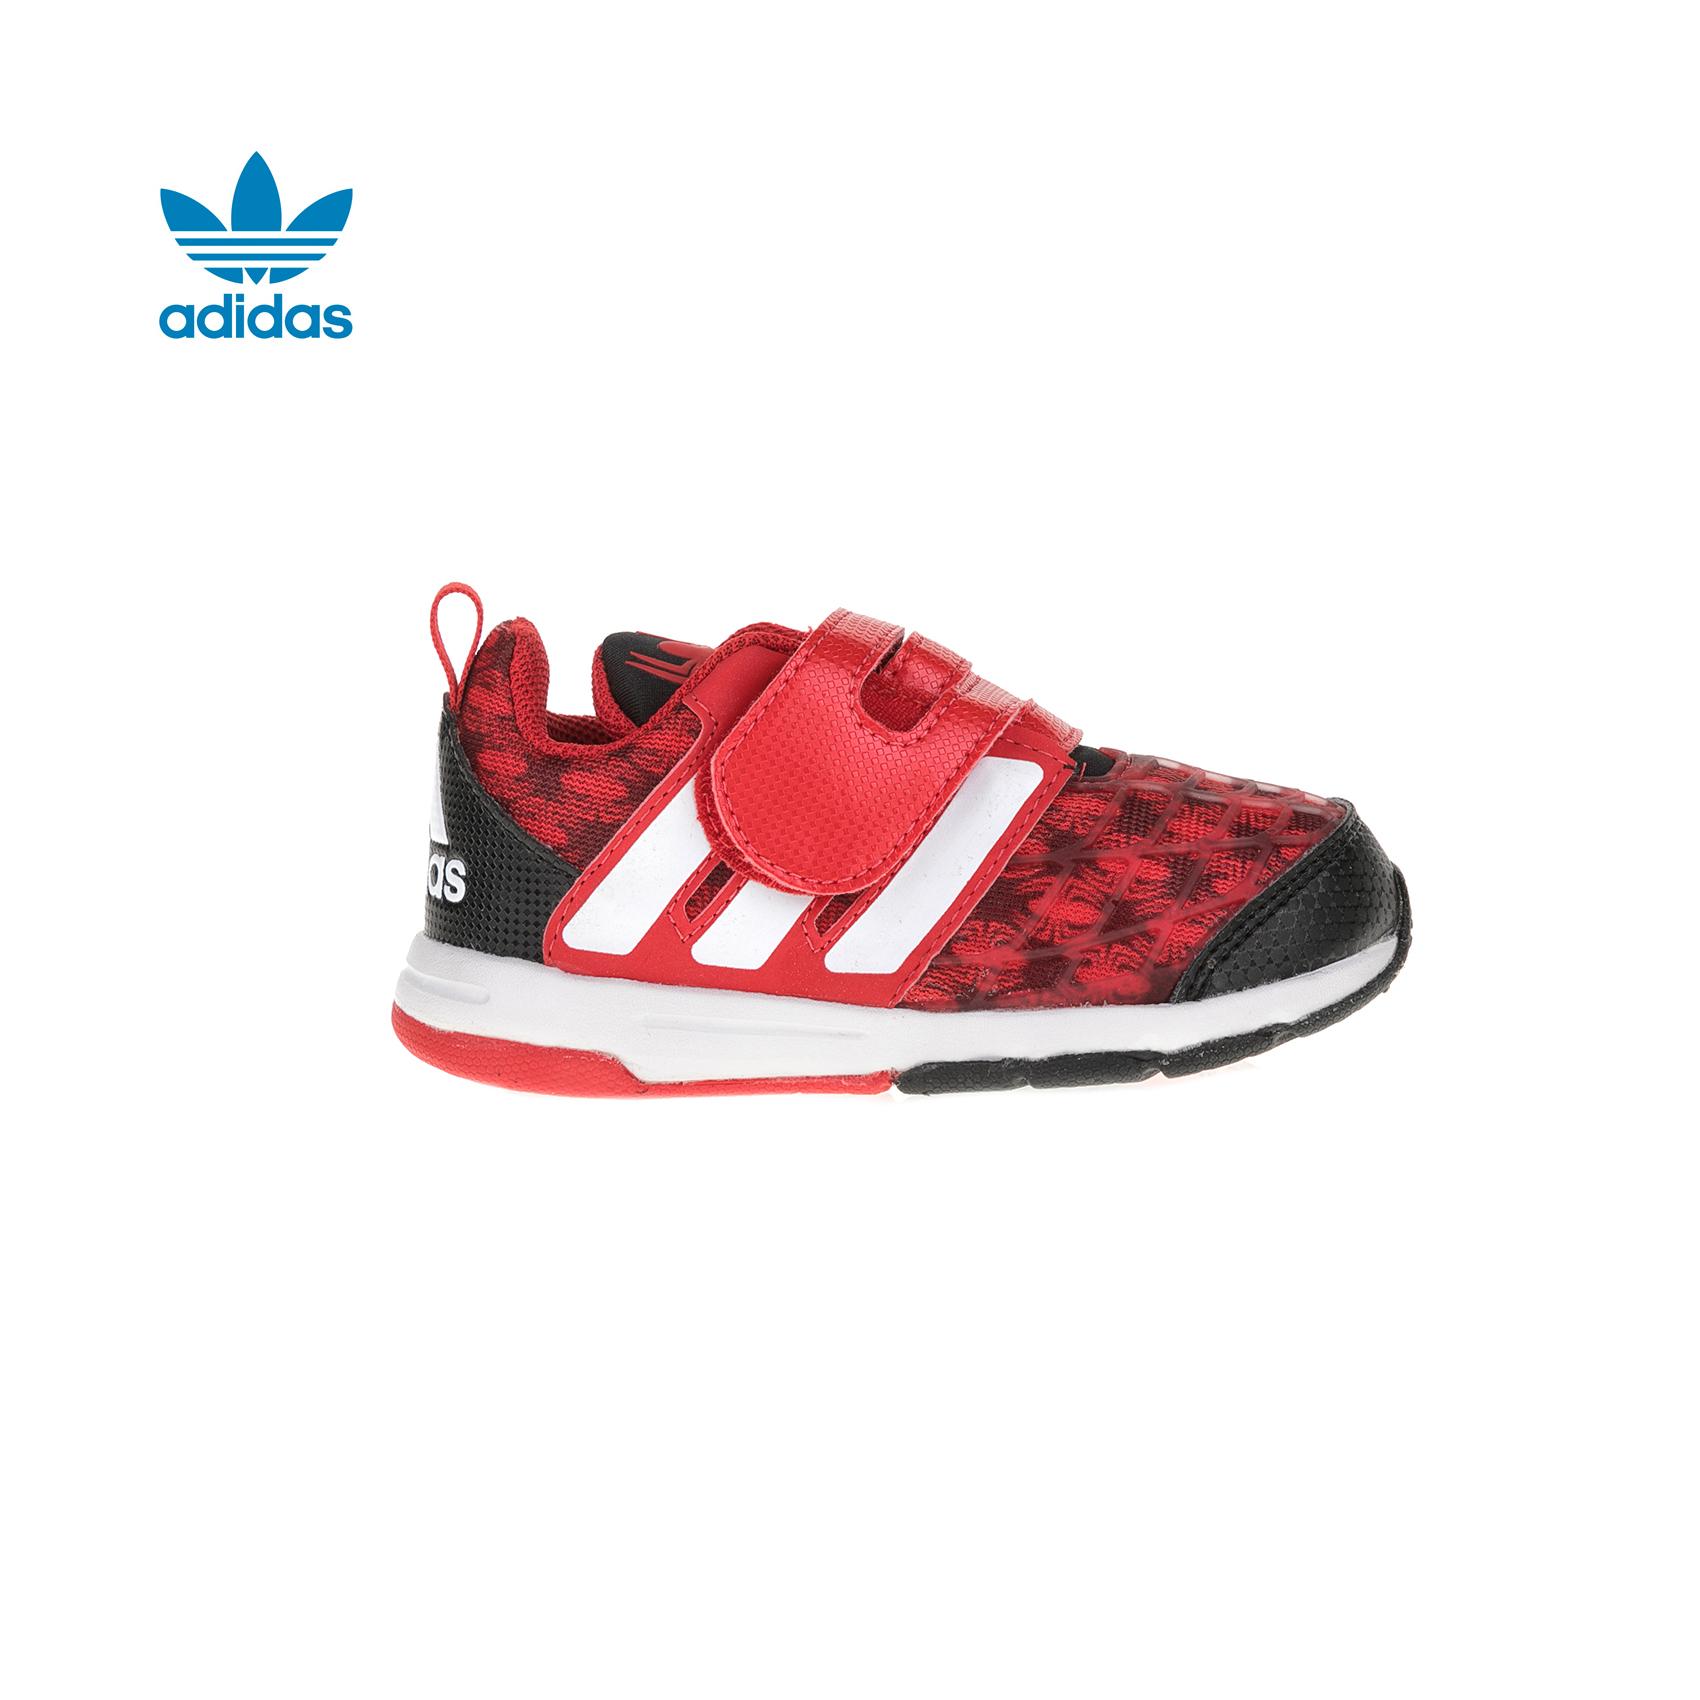 adidas Originals – Βρεφικά παπούτσια adidas Marvel Spider-Man CF I κόκκινα